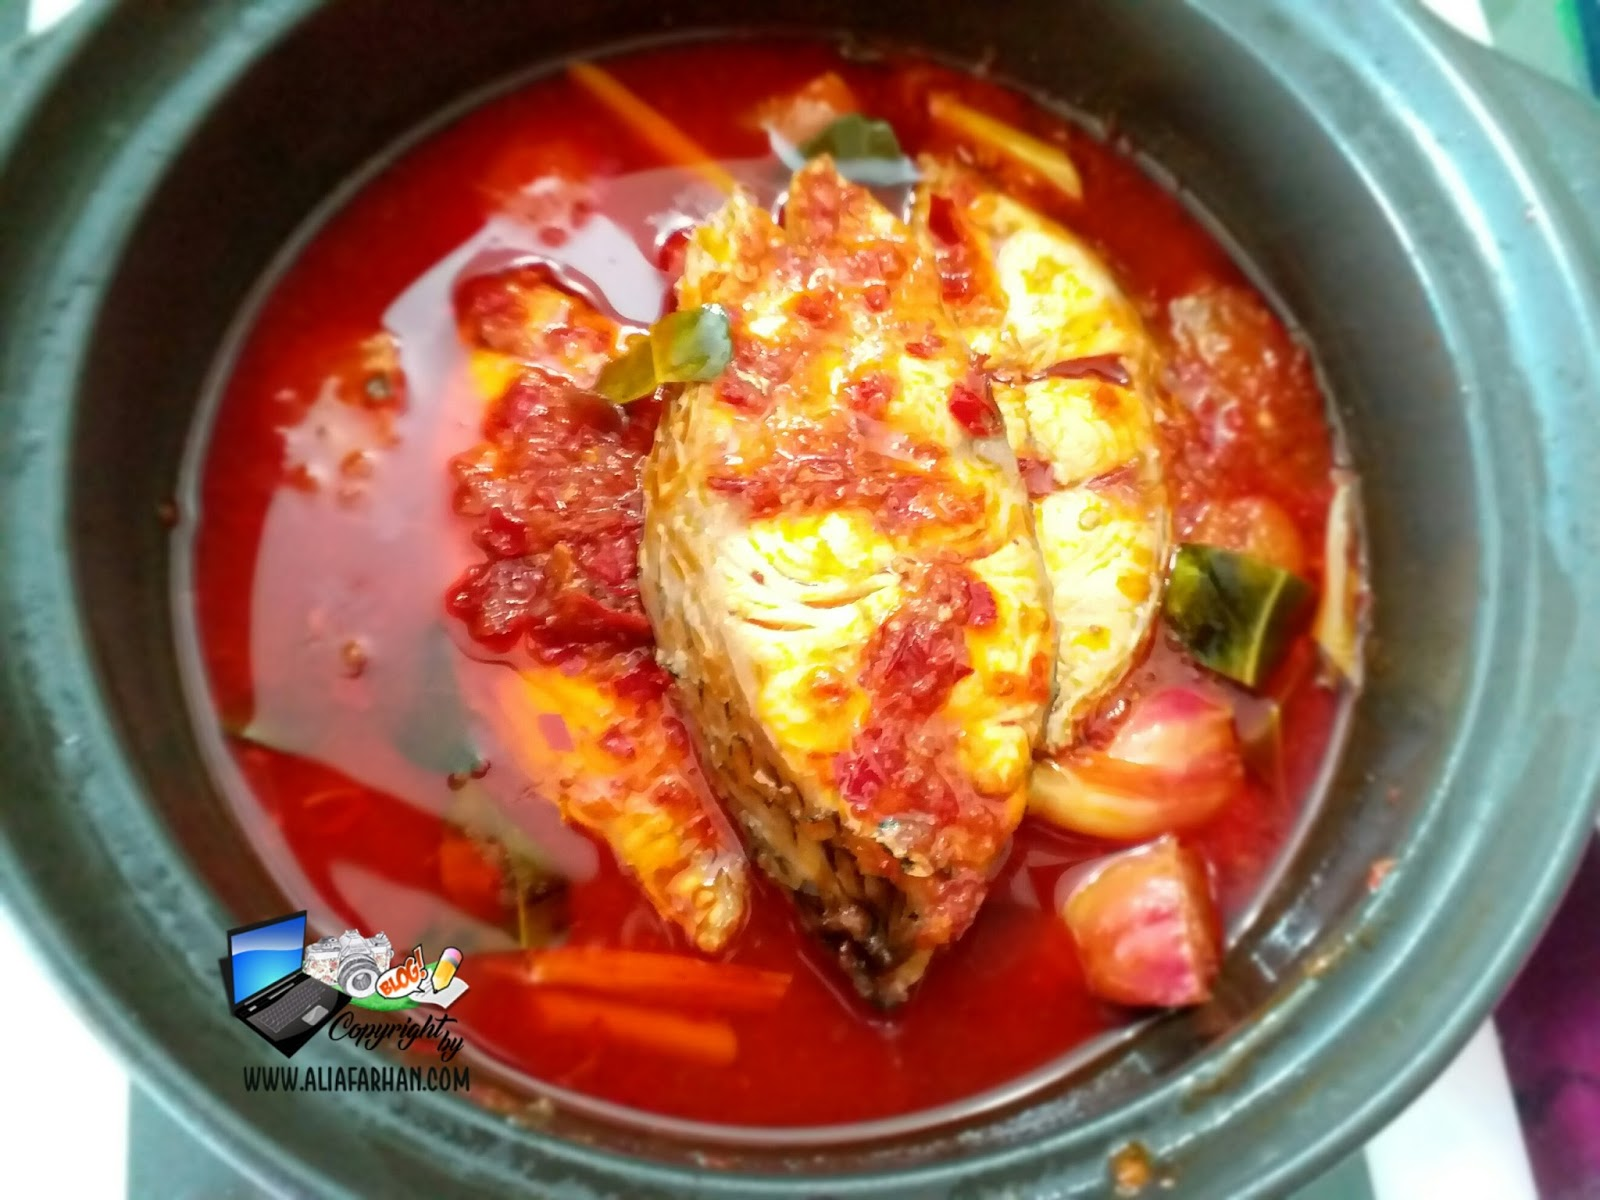 Resepi Ikan Selayang Masak Asam Pedas - Resep Bunda Erita